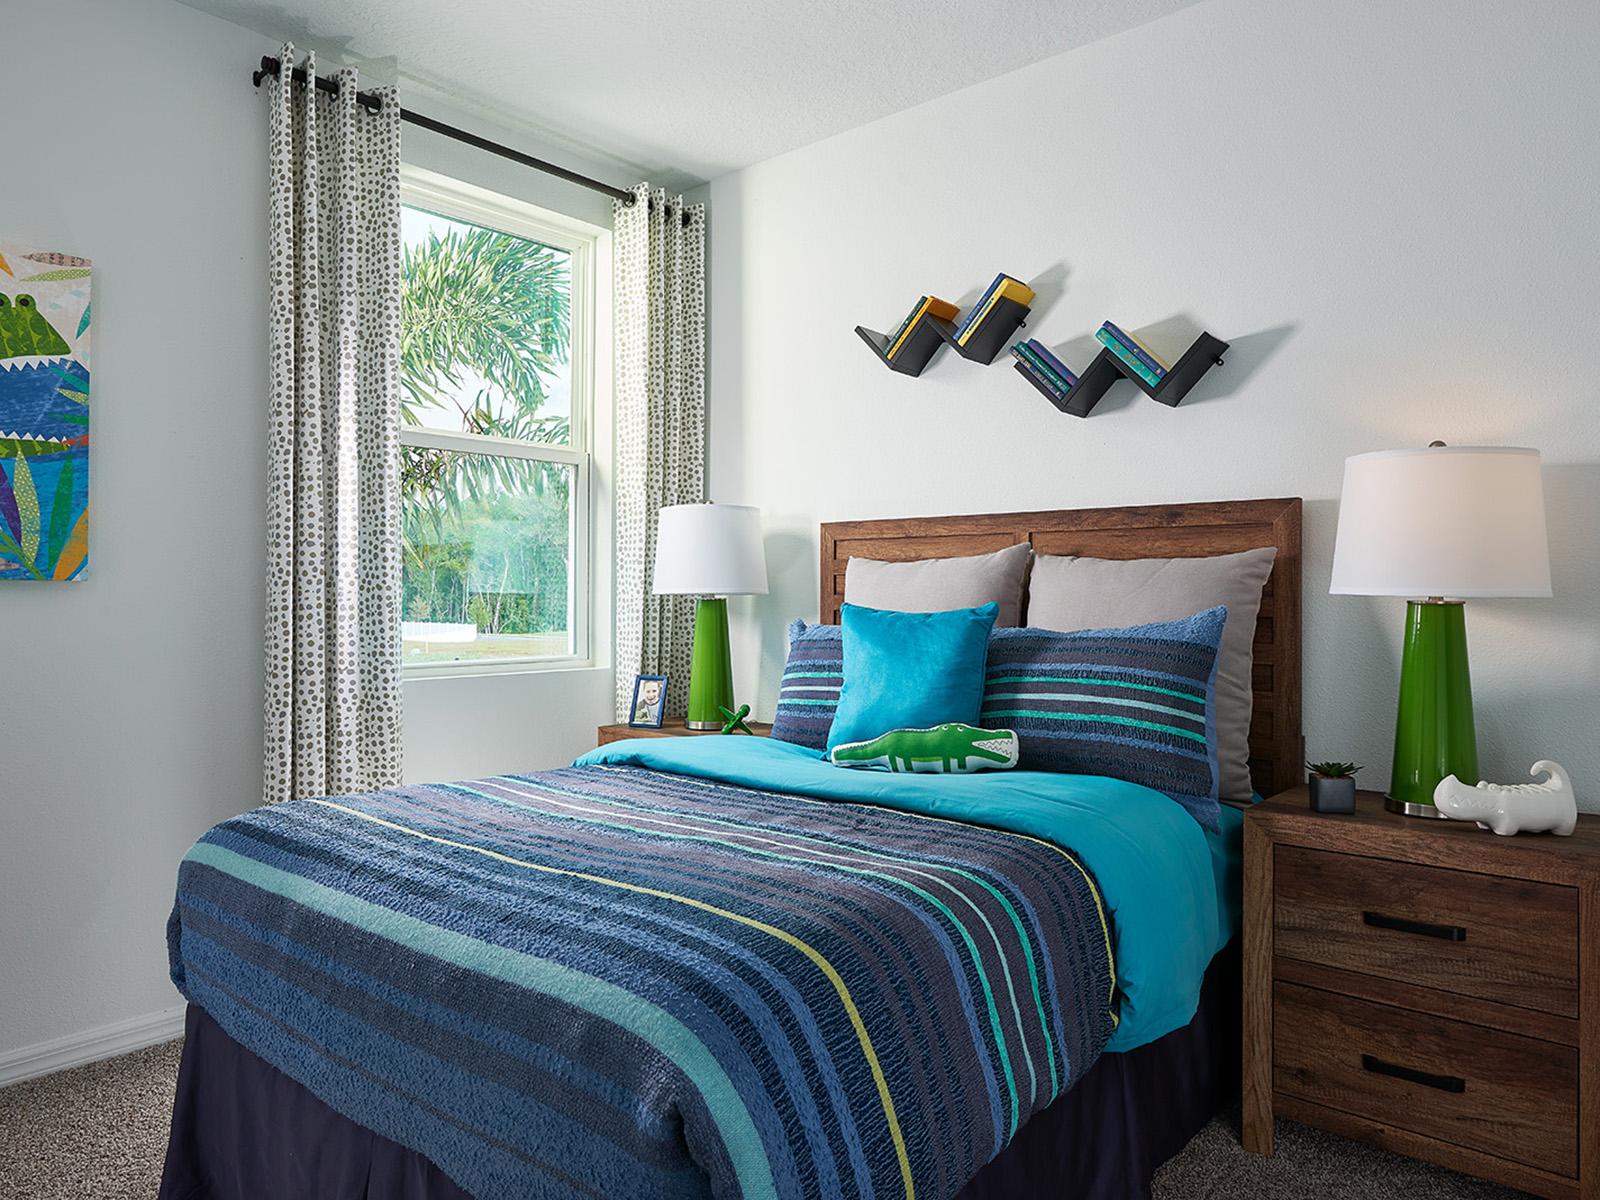 07_ORL_LDE_Everglade_Bed2_01